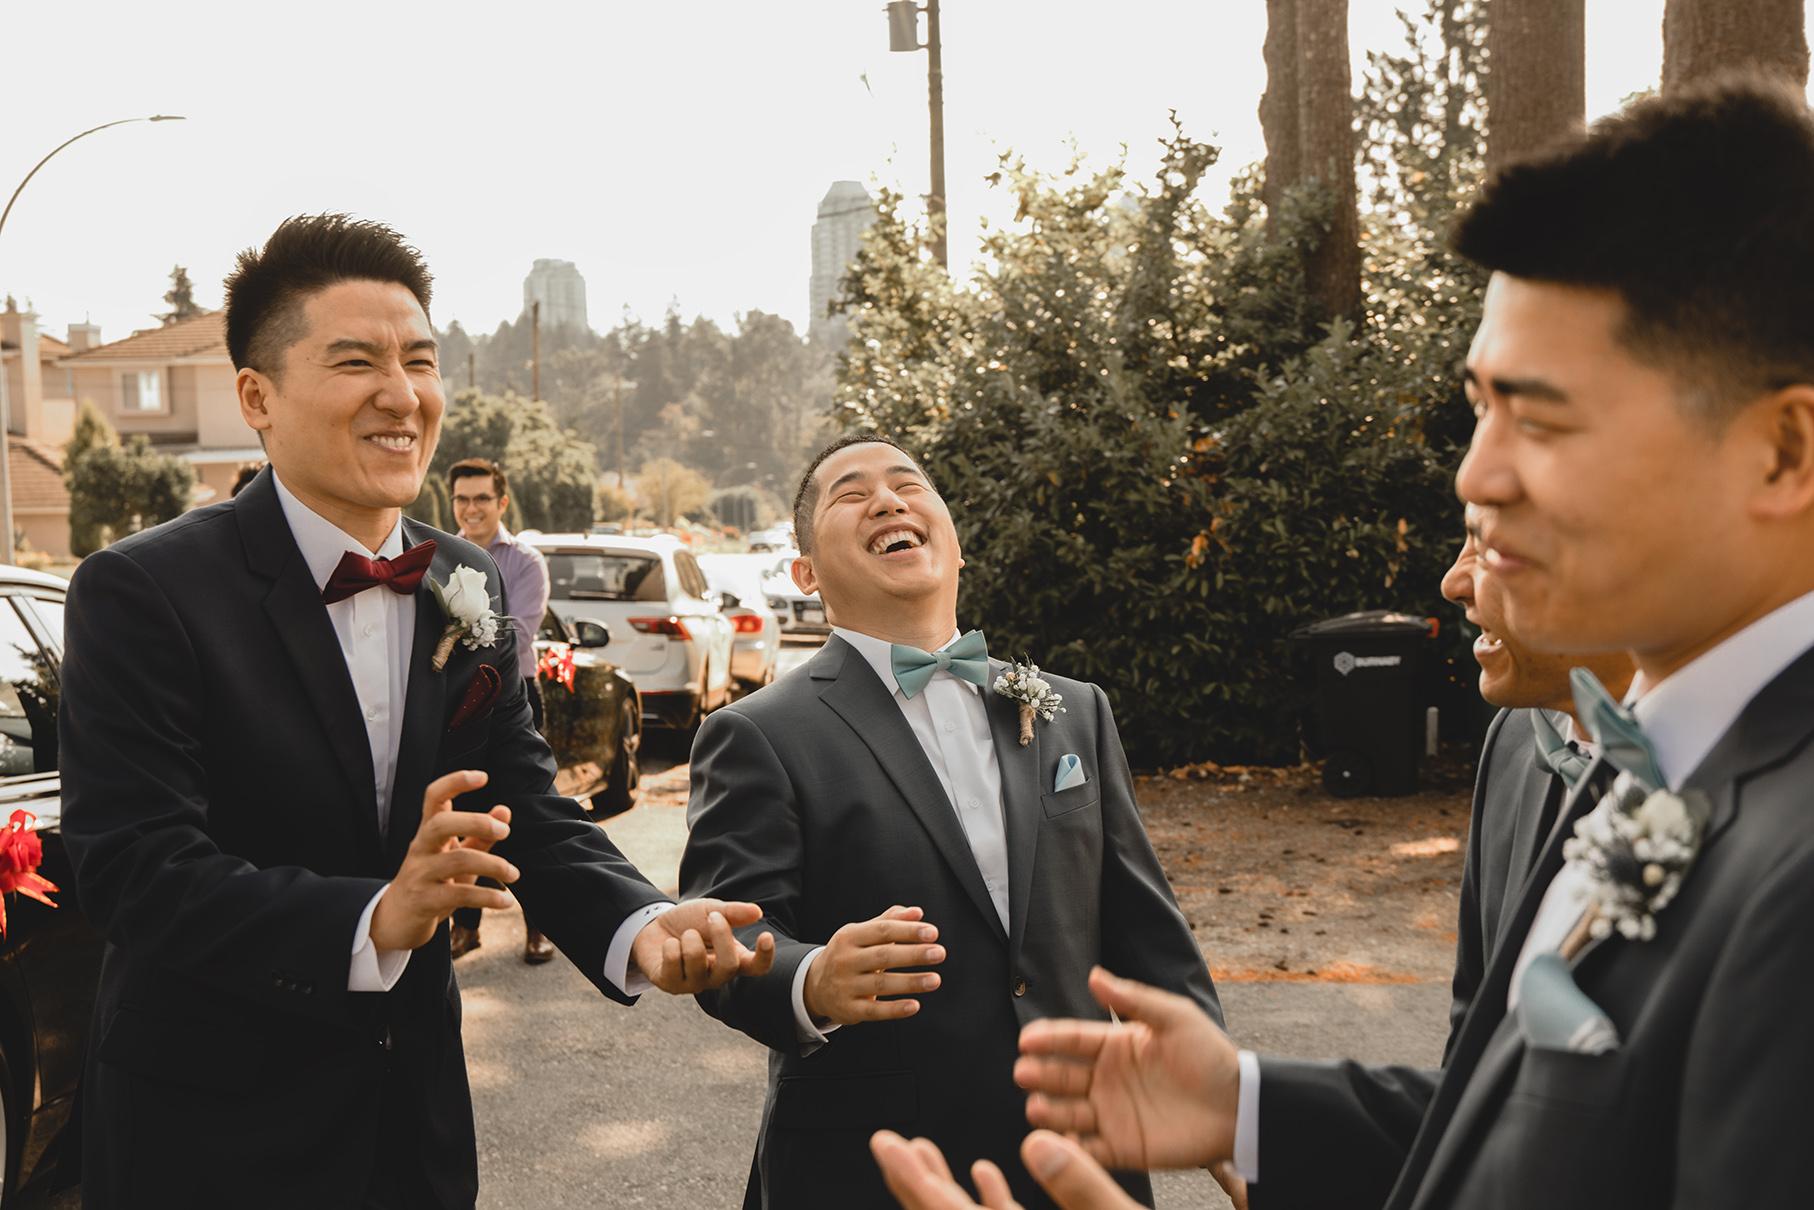 Wedding Photographer Vancouver